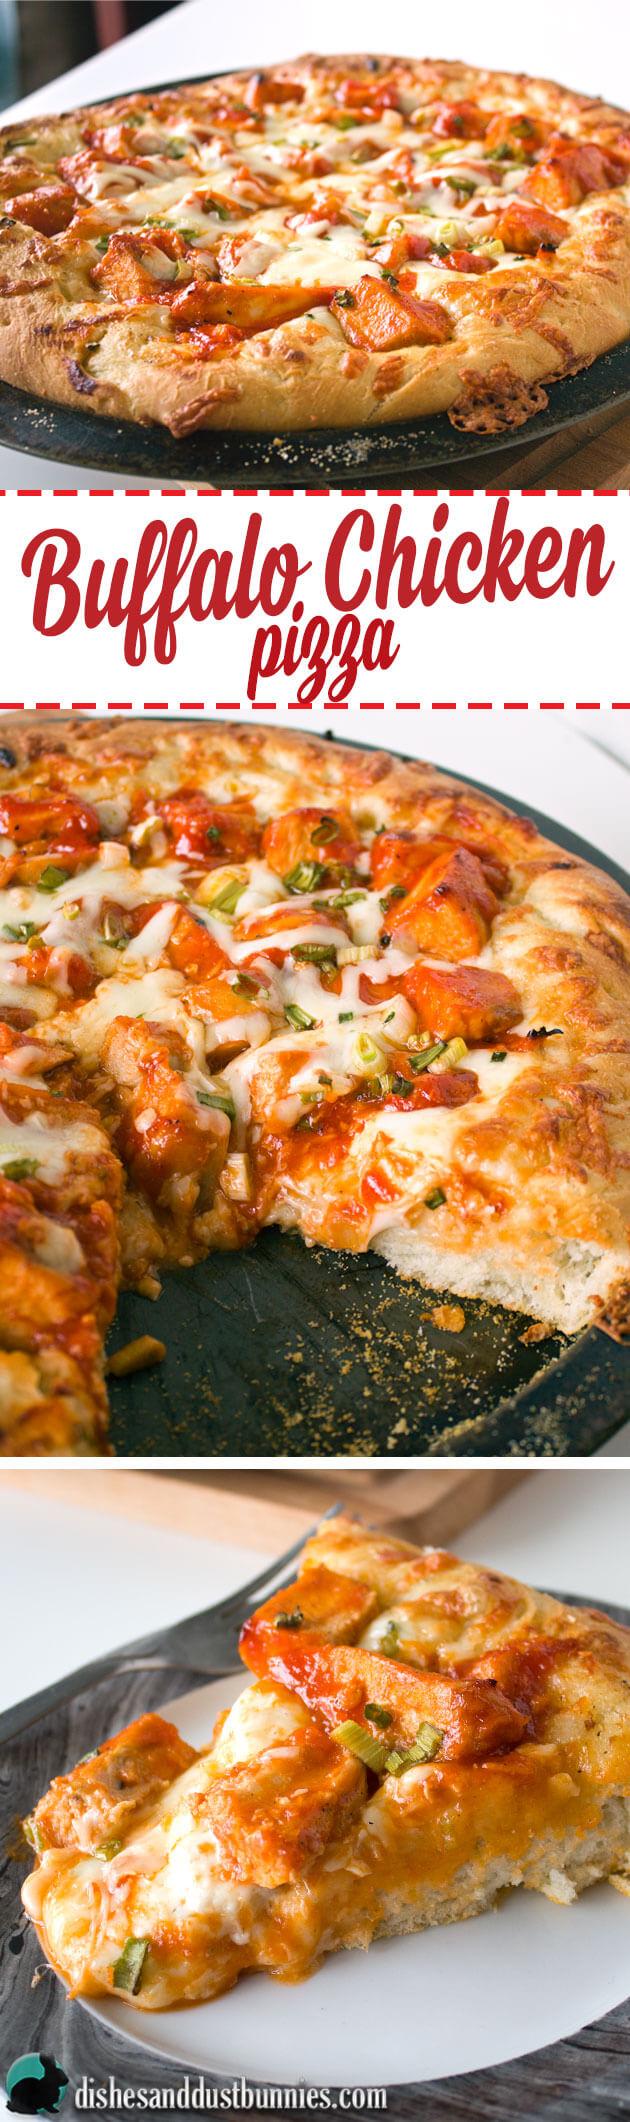 Buffalo Chicken Pizza from dishesanddustbunnies.com